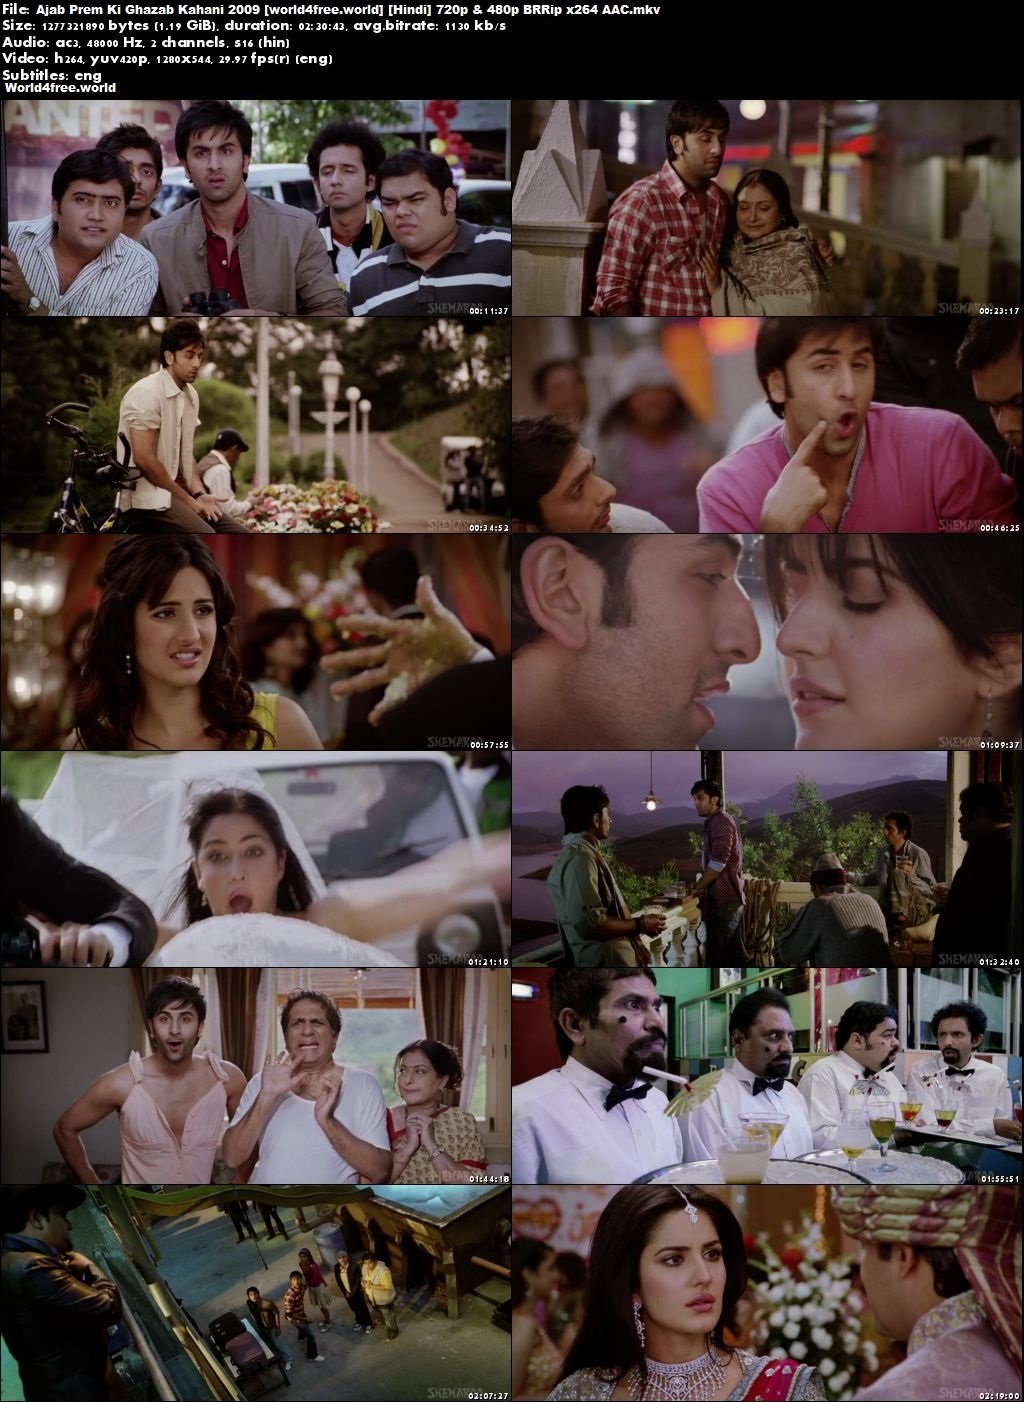 Screen Shoot of Ajab Prem Ki Ghazab Kahani 2009 Full Hindi Movie Download 720p BRRip